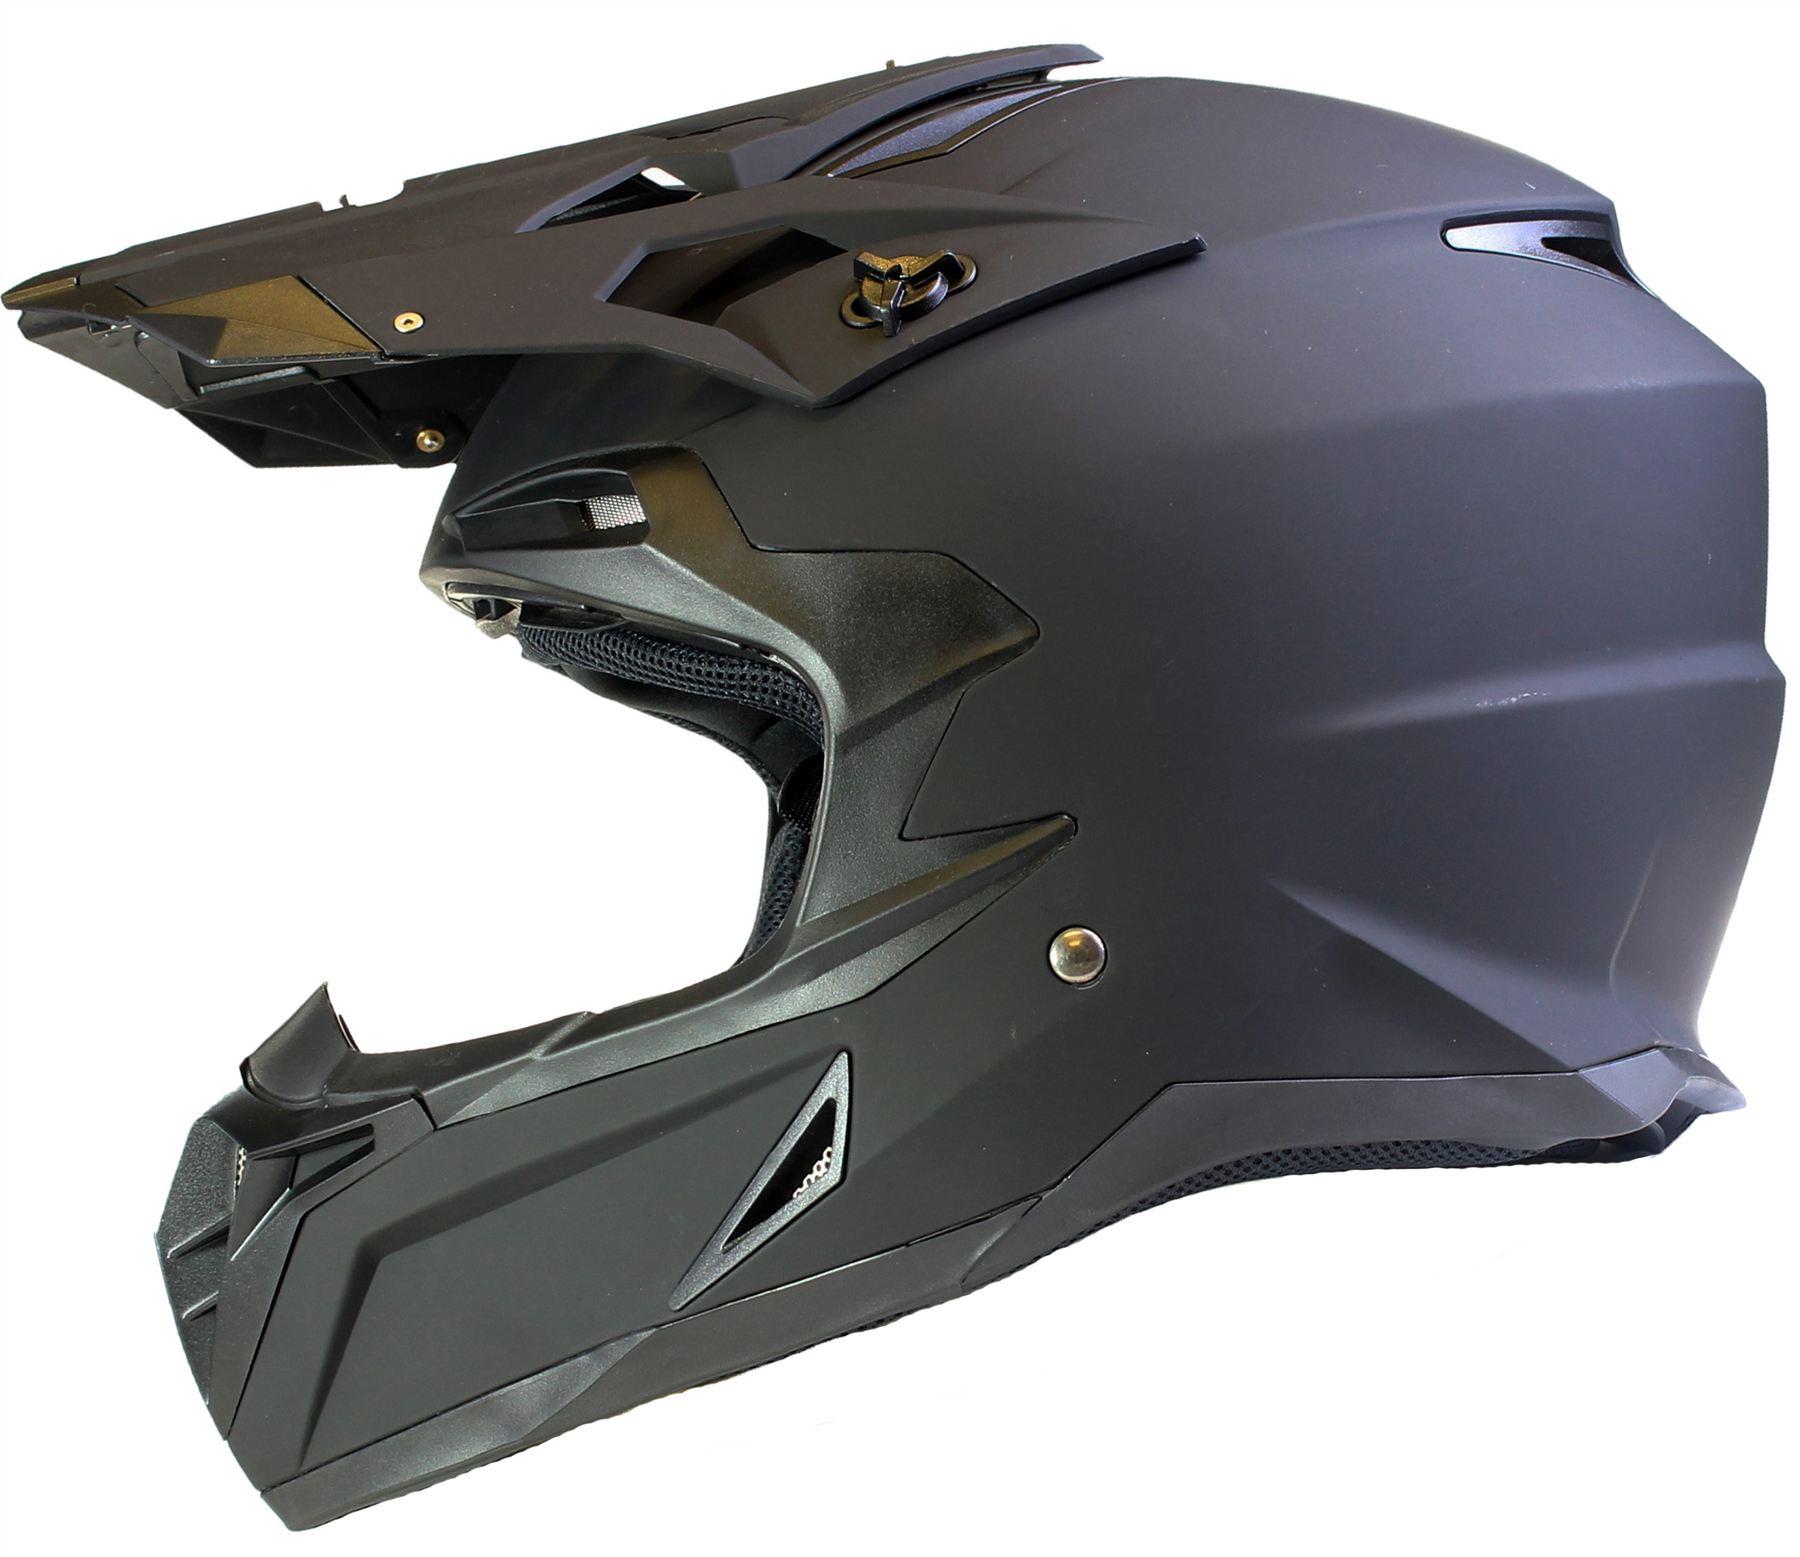 Casco-de-MOTOCROSS-Todotorreno-ECE22-05-Enduro-MX-Quads-Motocicleta-Moto